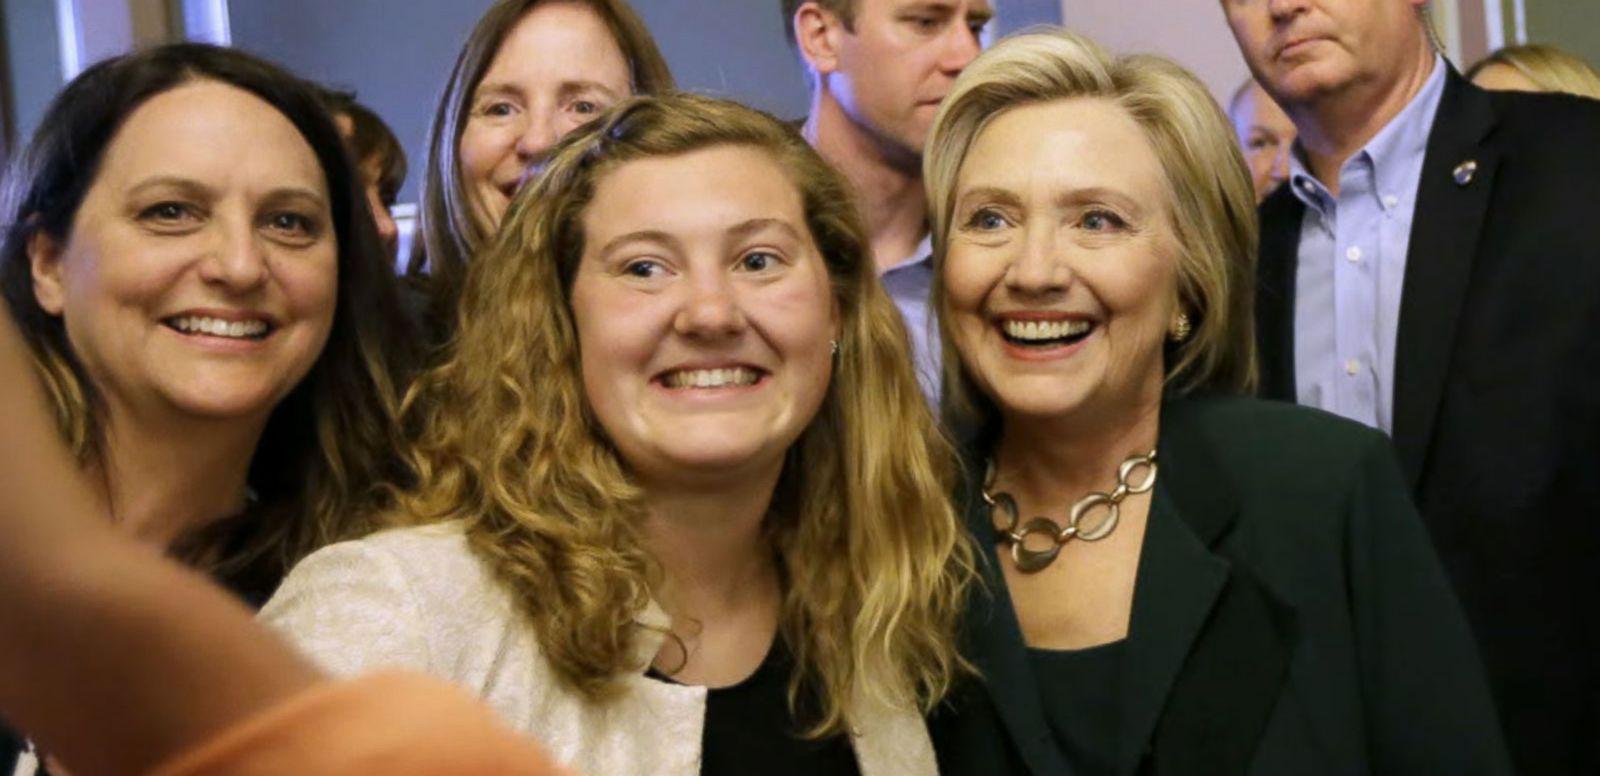 VIDEO: Hillary Clinton Campaign Kicks Off in Iowa